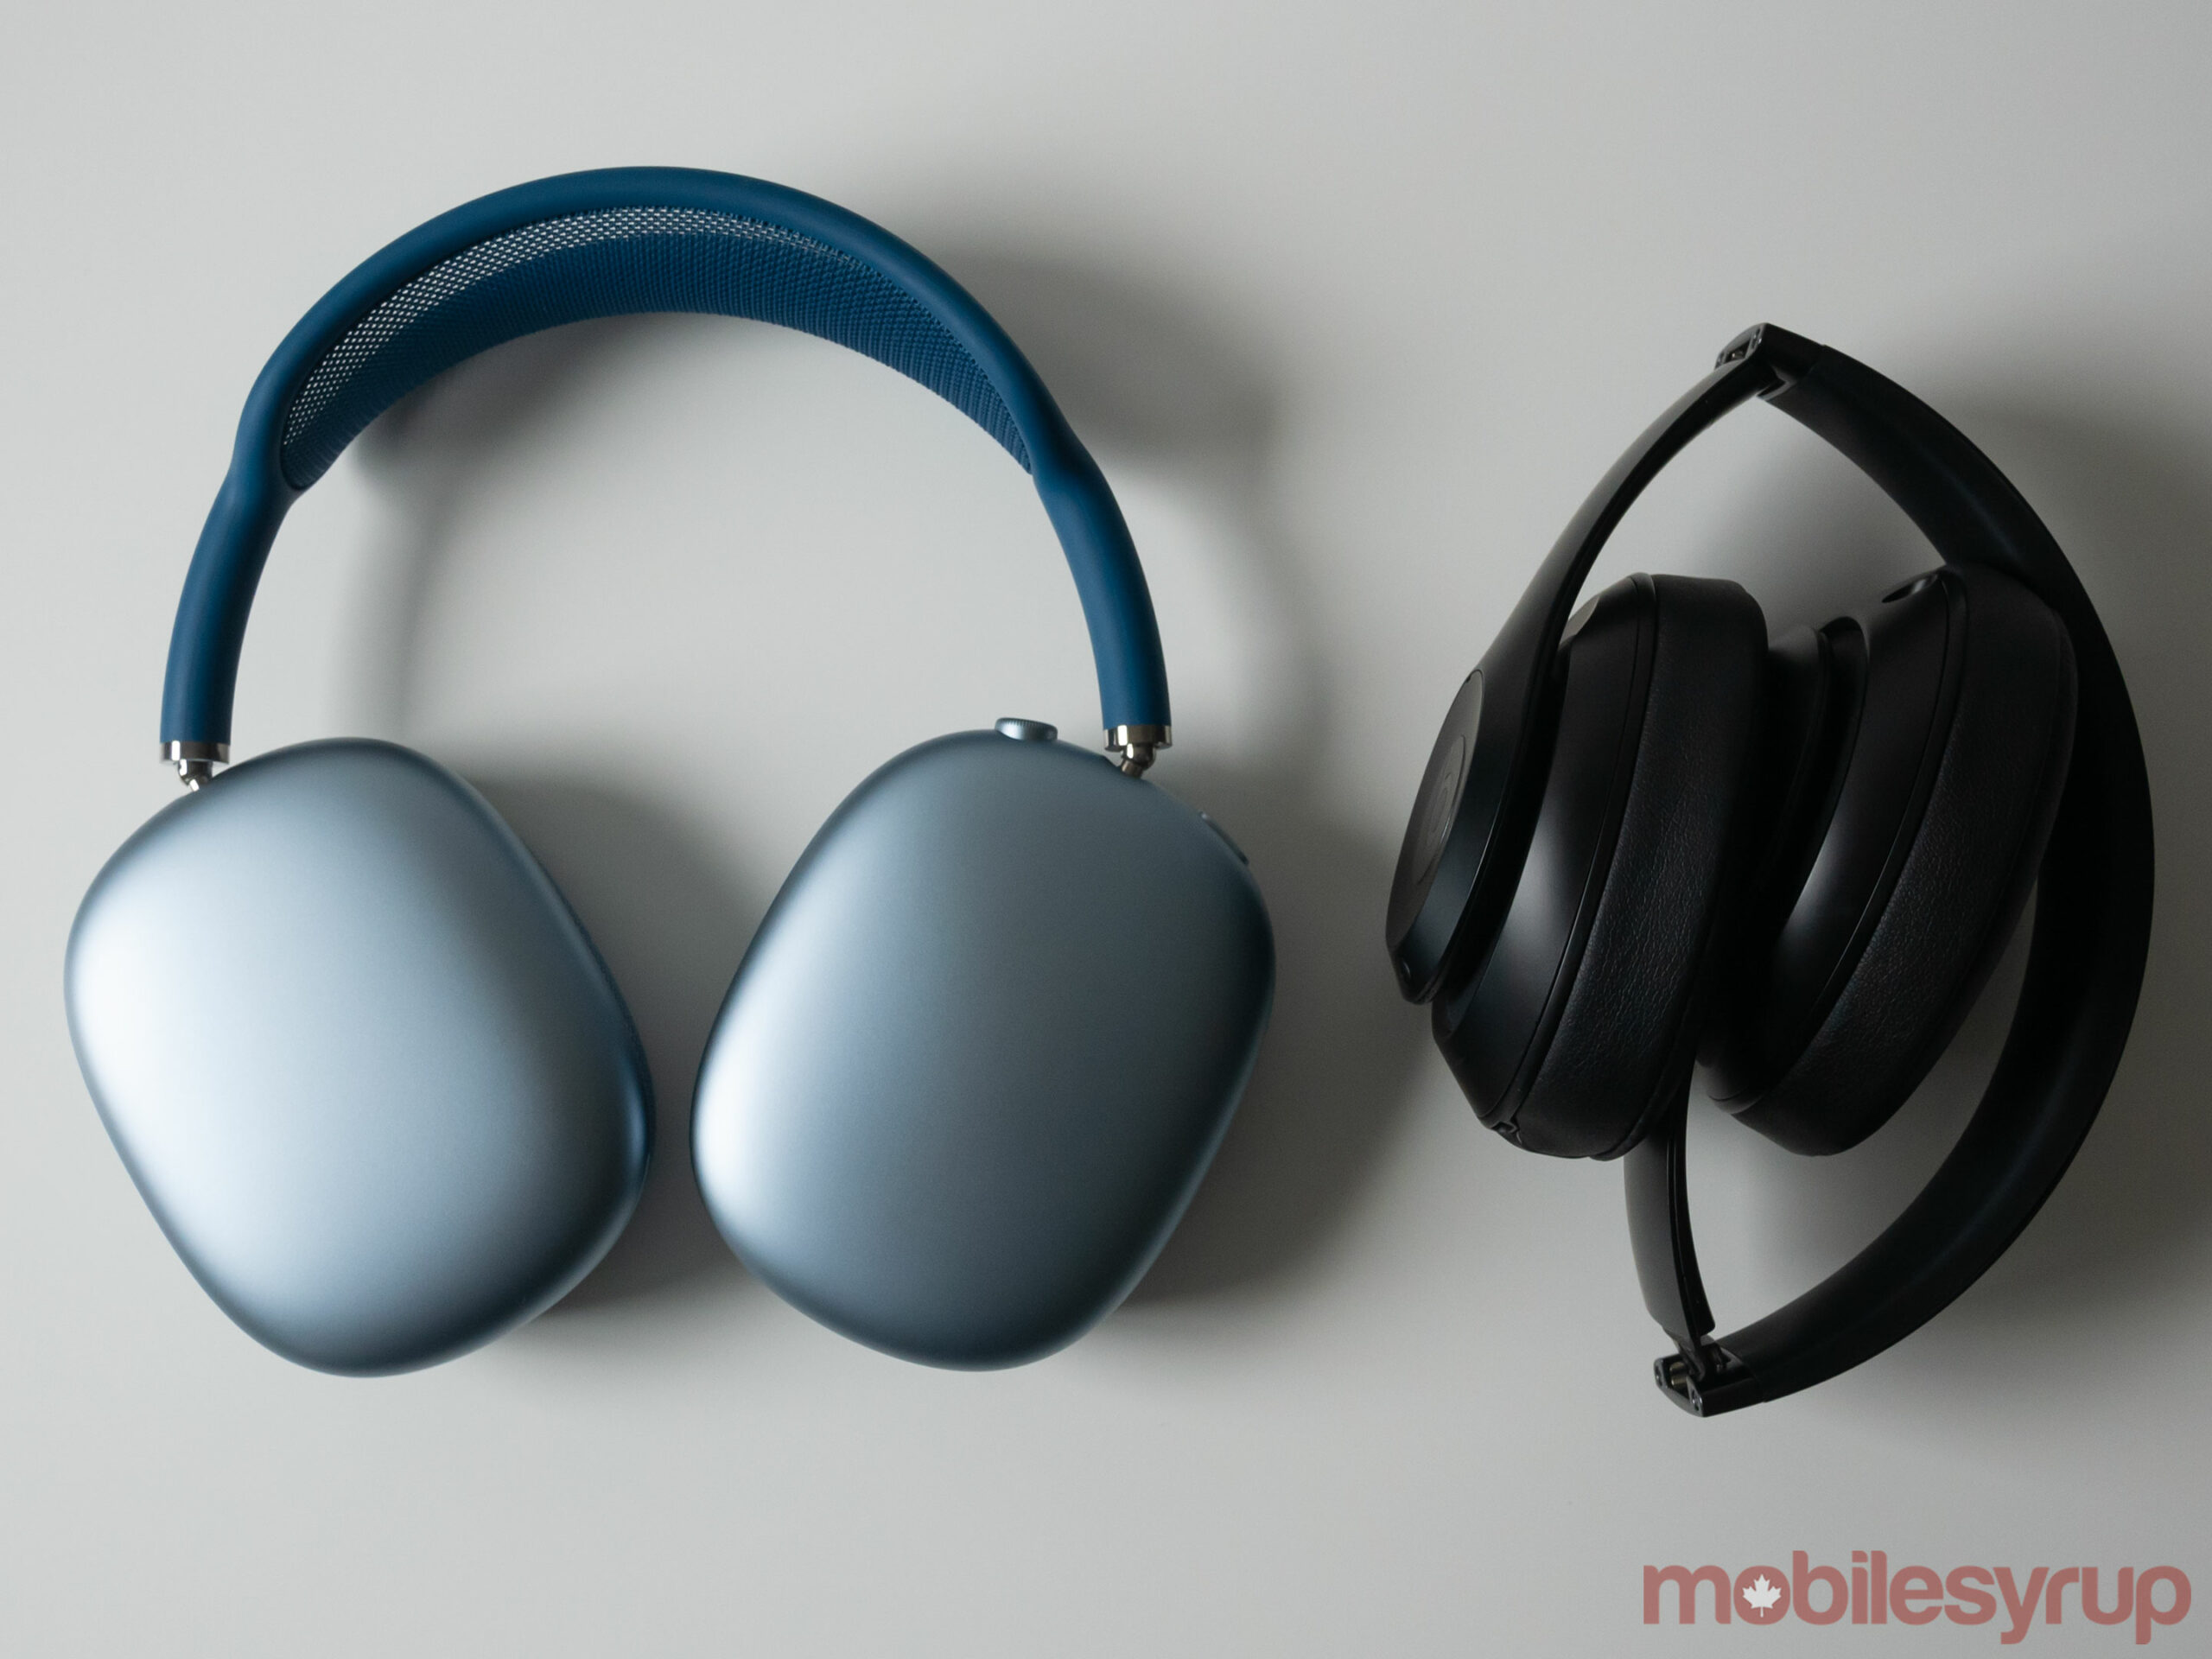 AirPods Max beside Beats Studio 3